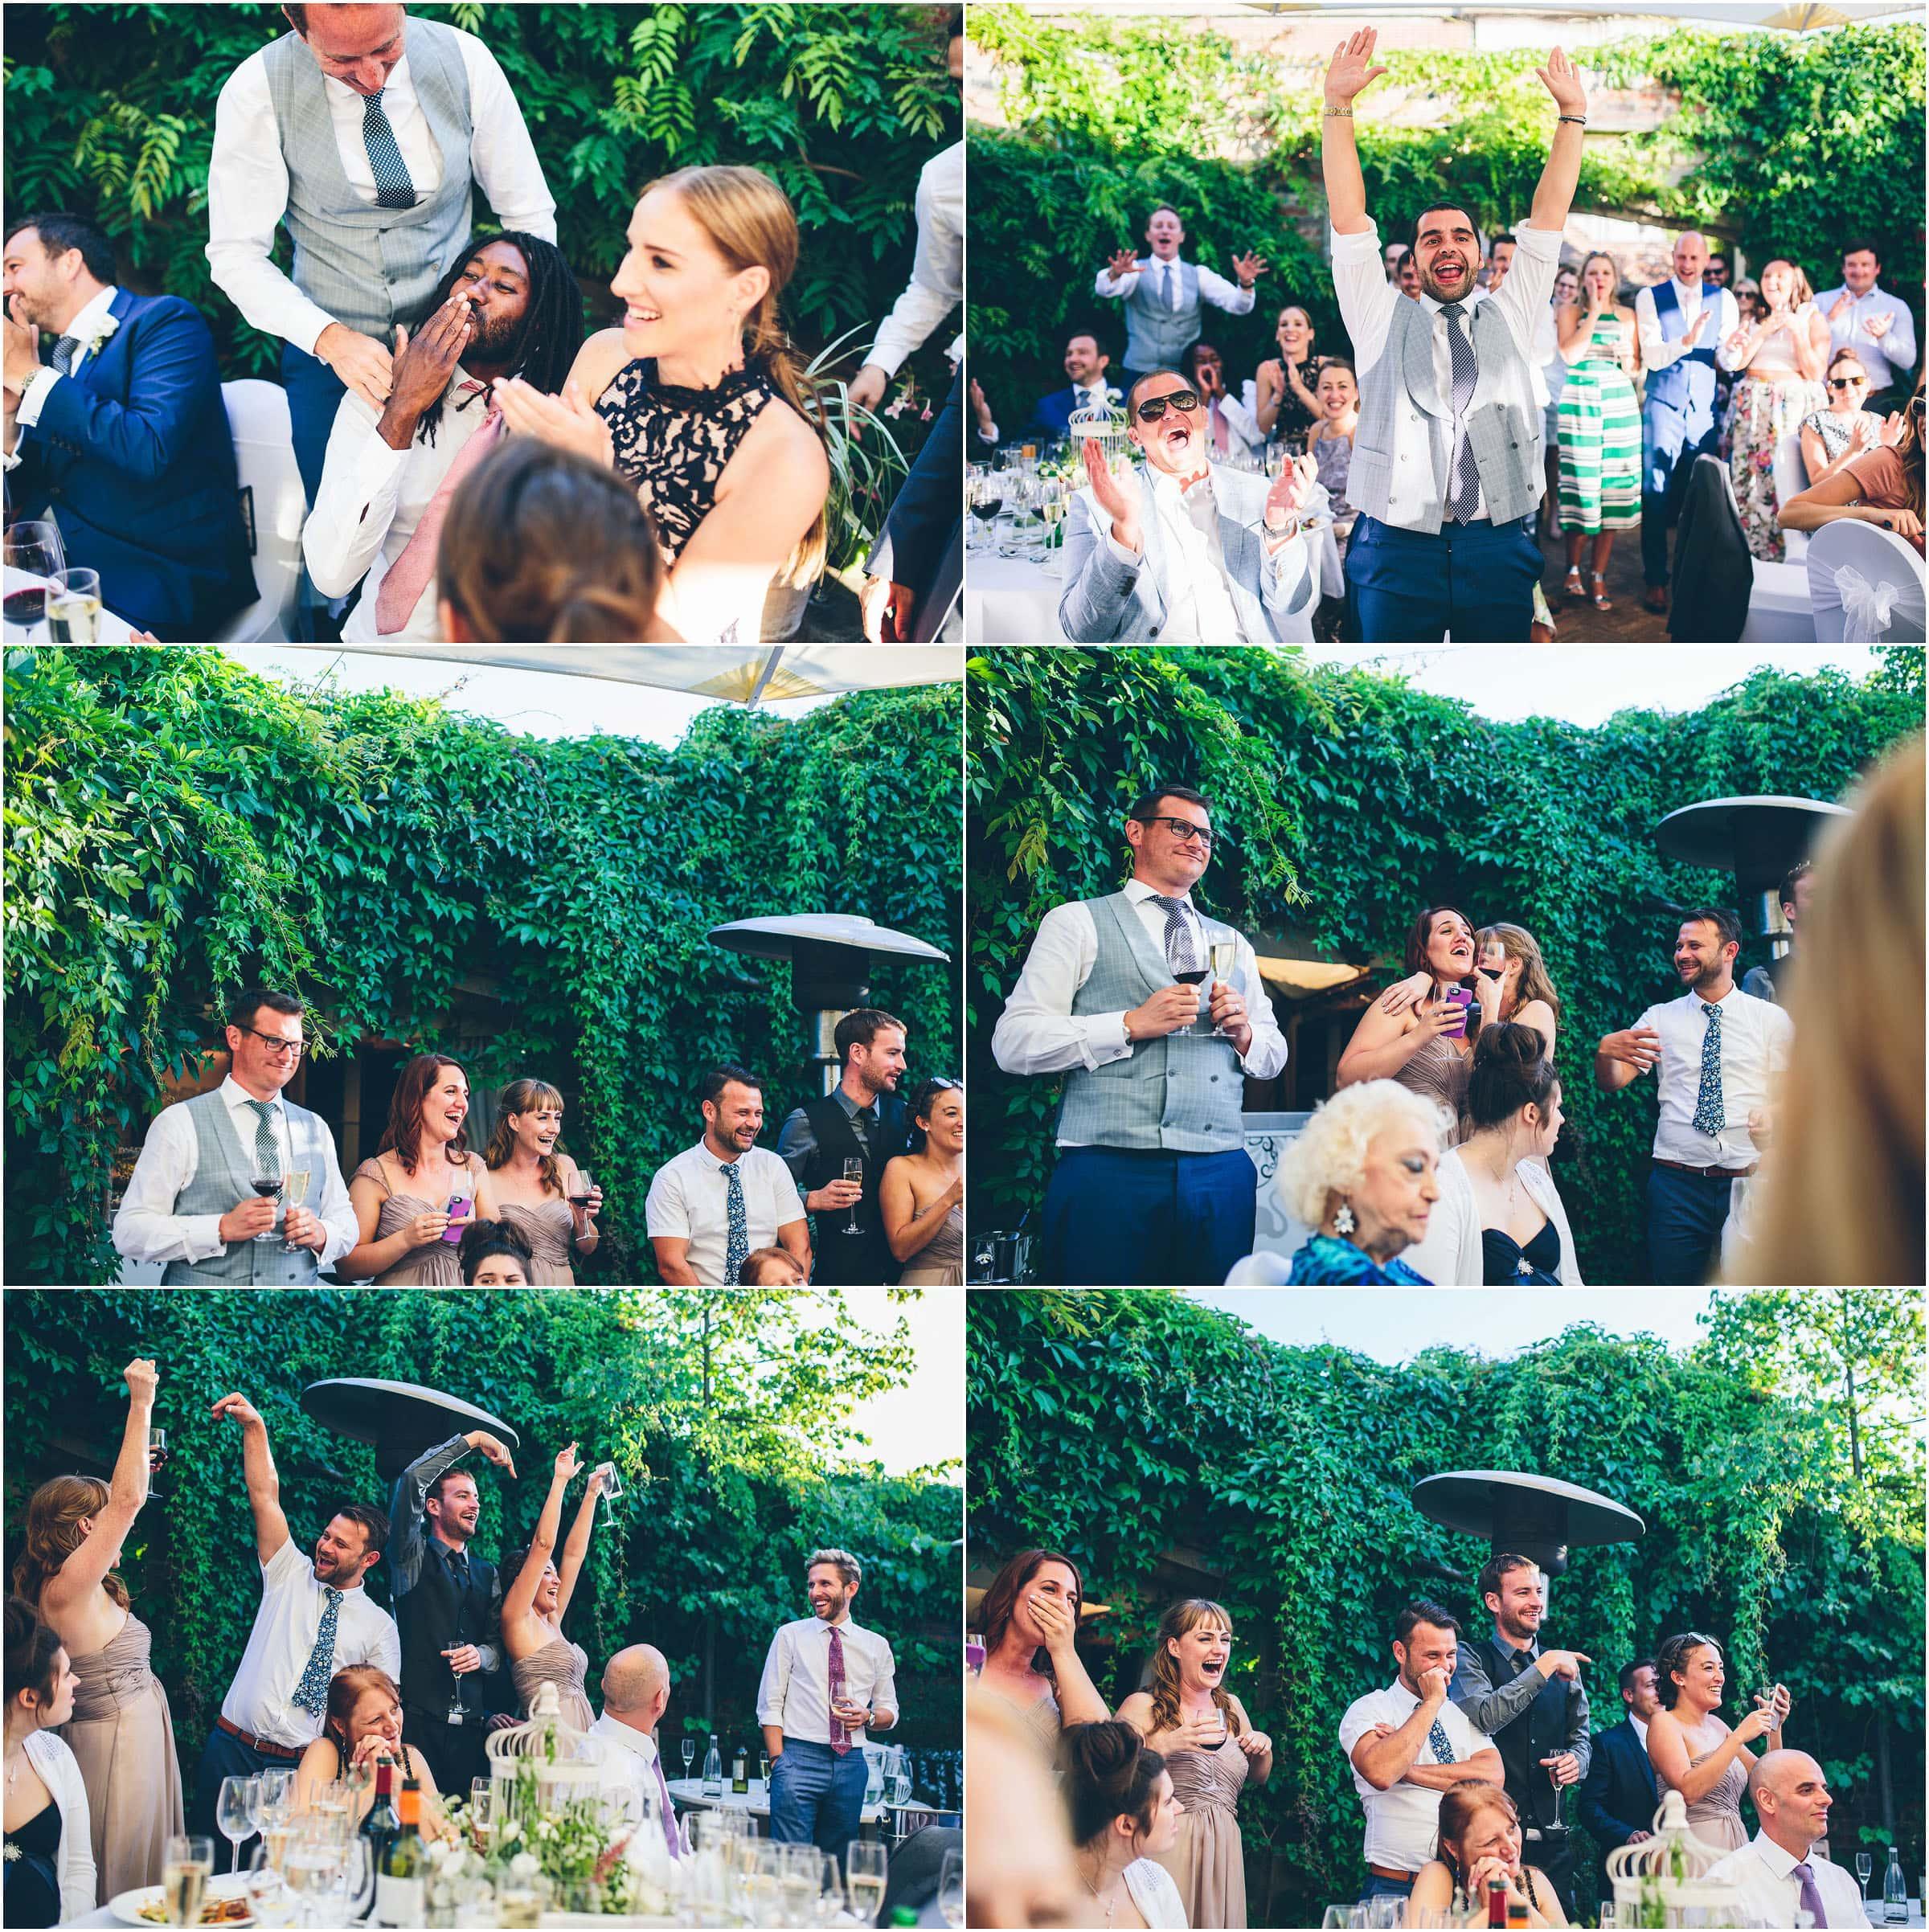 Kensington_Roof_Gardens_Wedding_Photography_0099